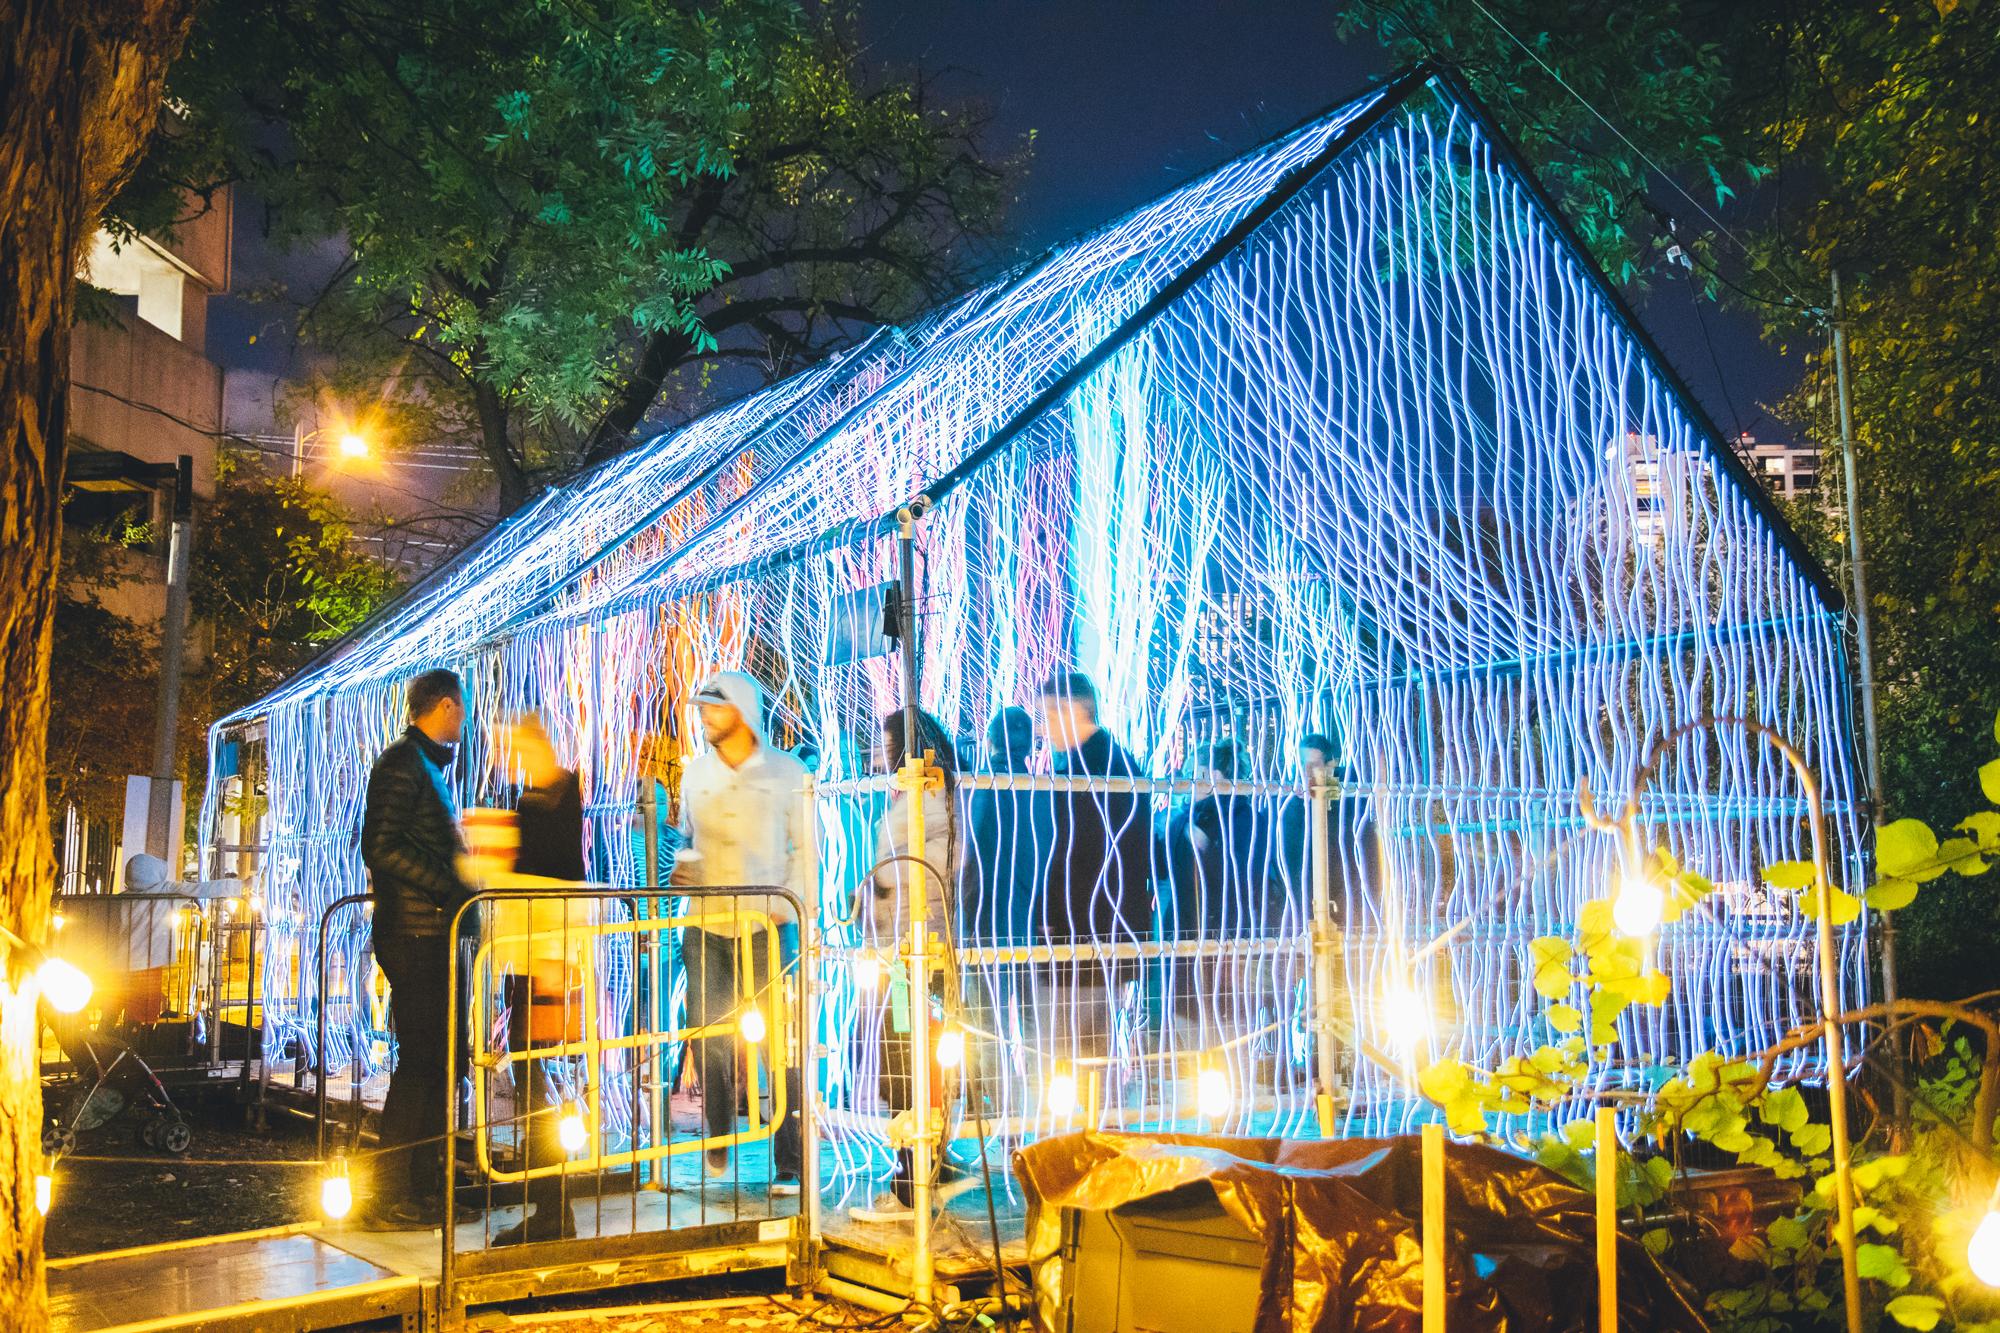 Waterloo Greenway's 6th Annual Creek Show